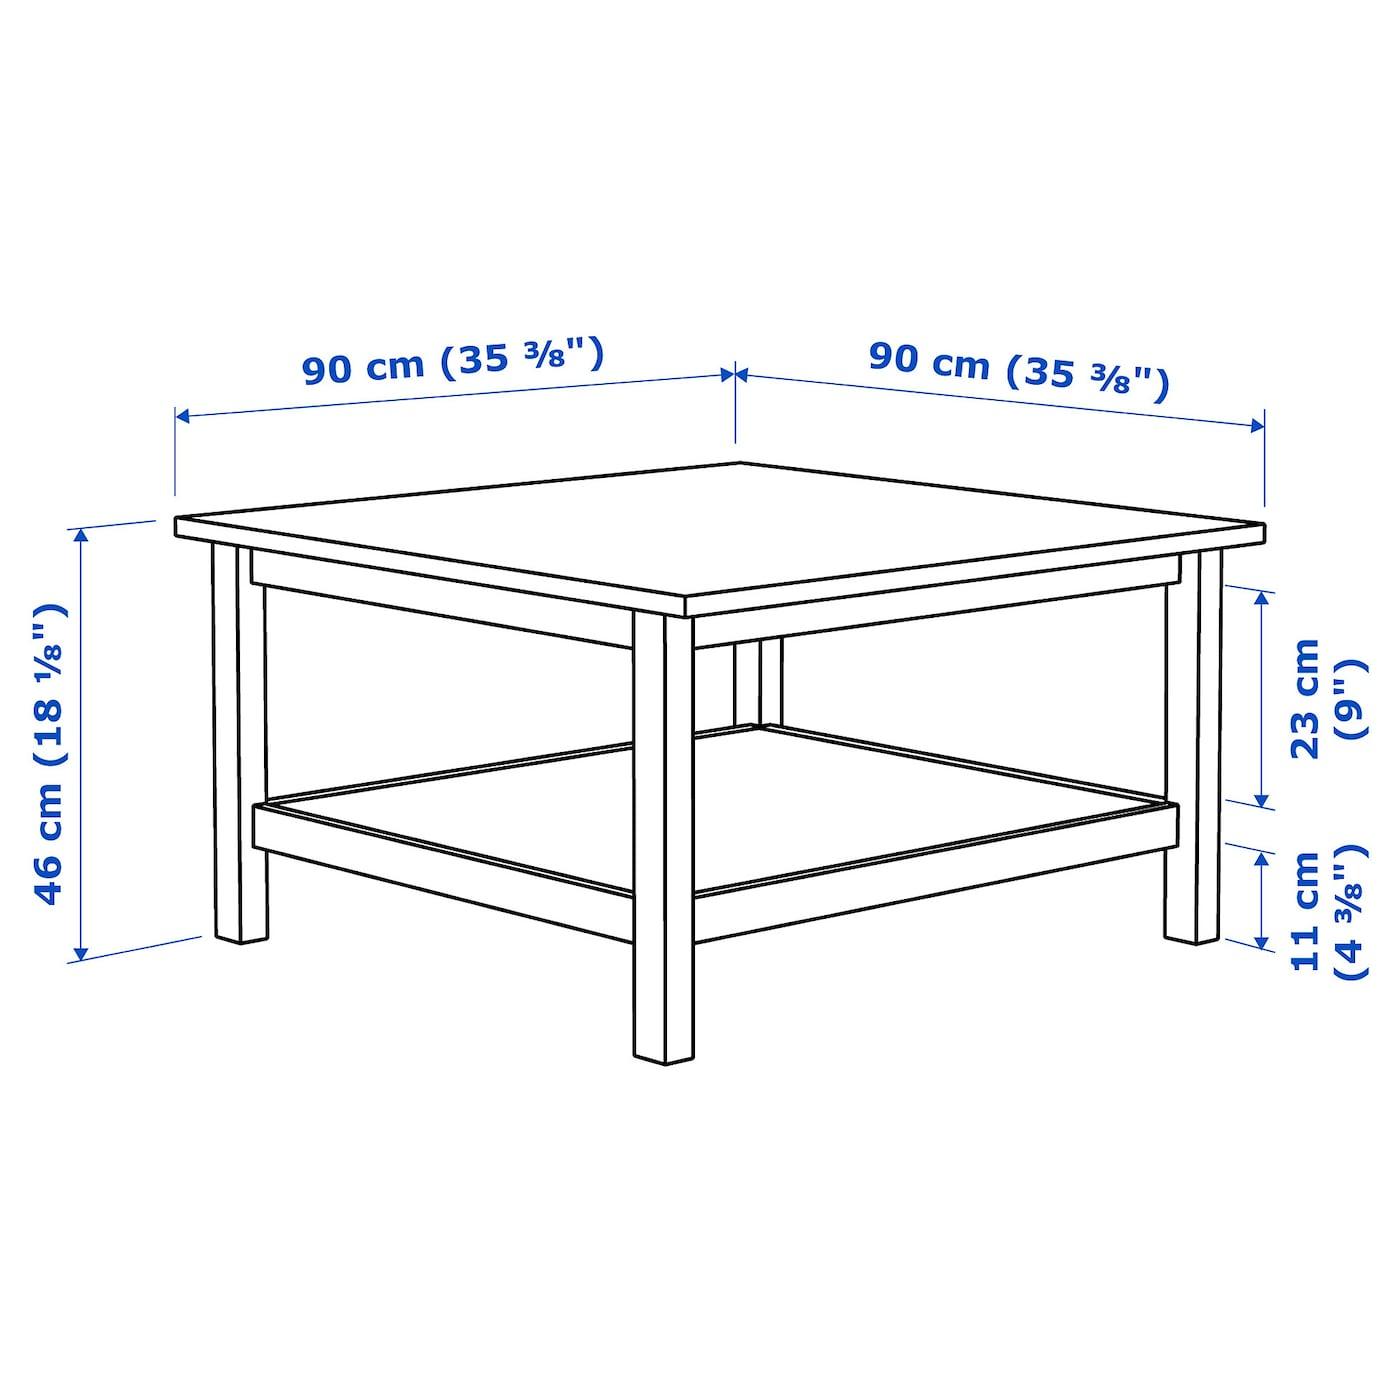 Hemnes Coffee Table White Stain Light Brown 90x90 Cm Ikea Ireland [ 1400 x 1400 Pixel ]